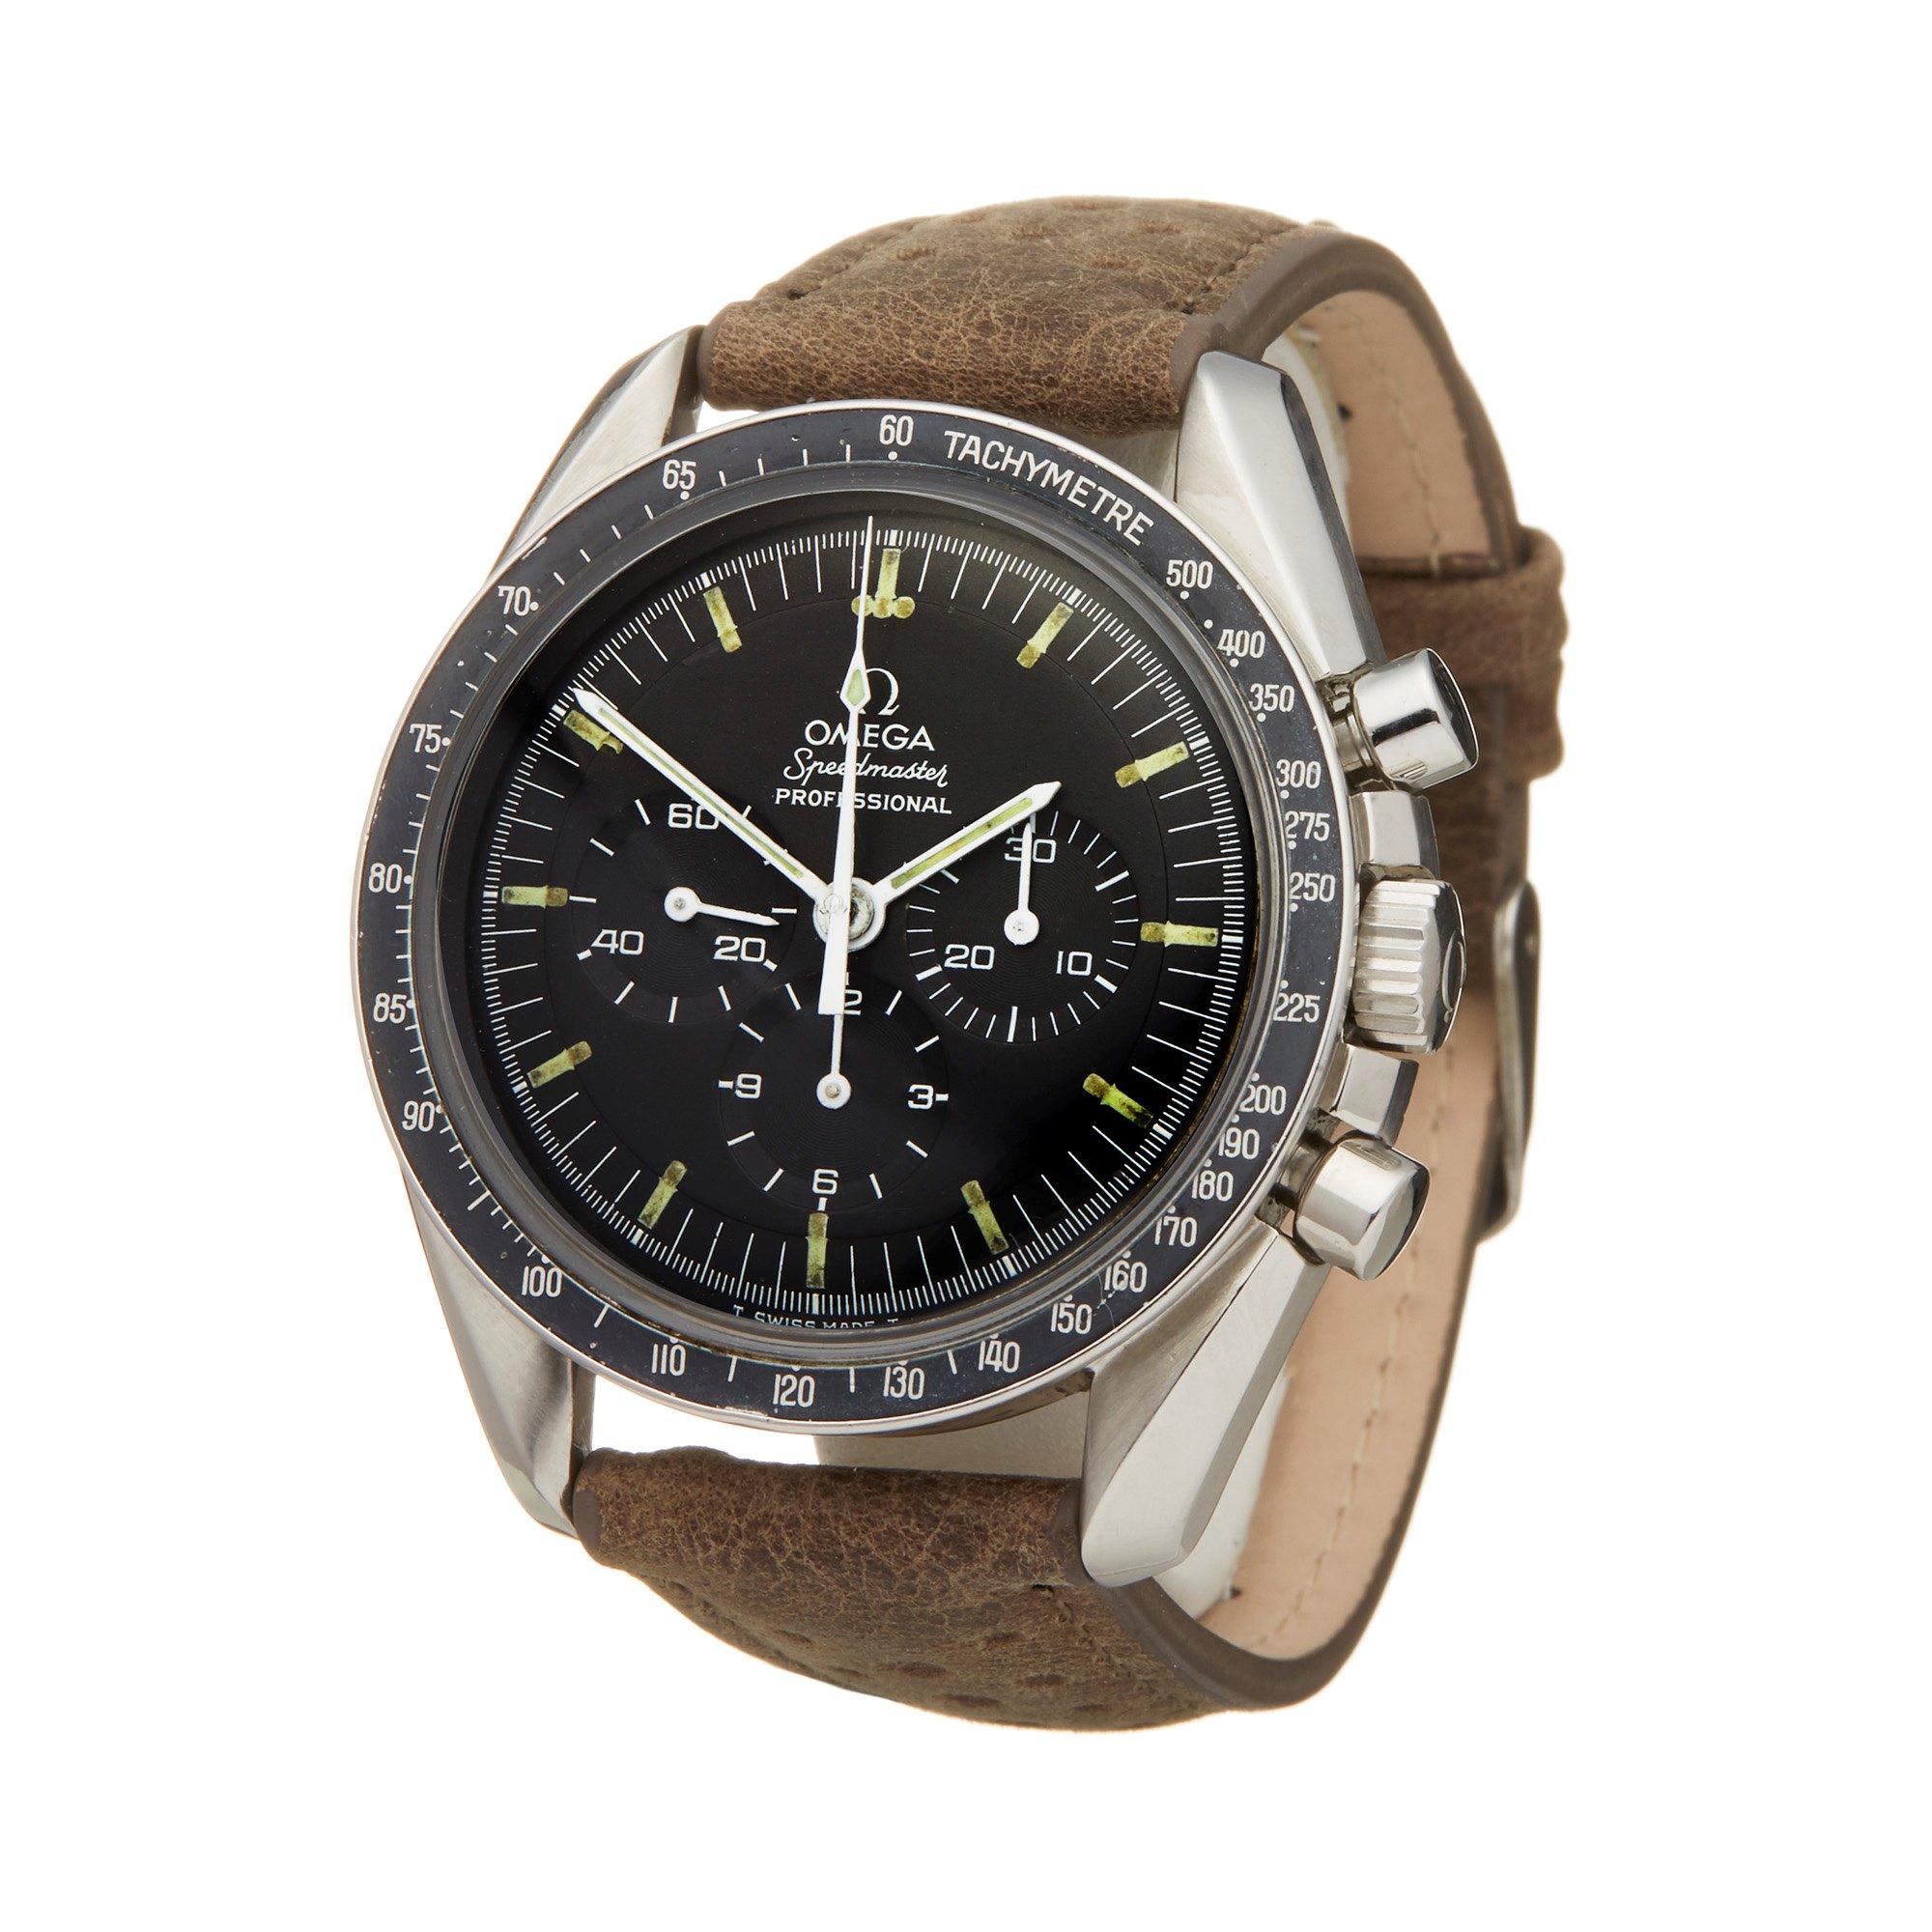 Omega Speedmaster Straight Writing Chronograph Stainless Steel 145.022-69 ST